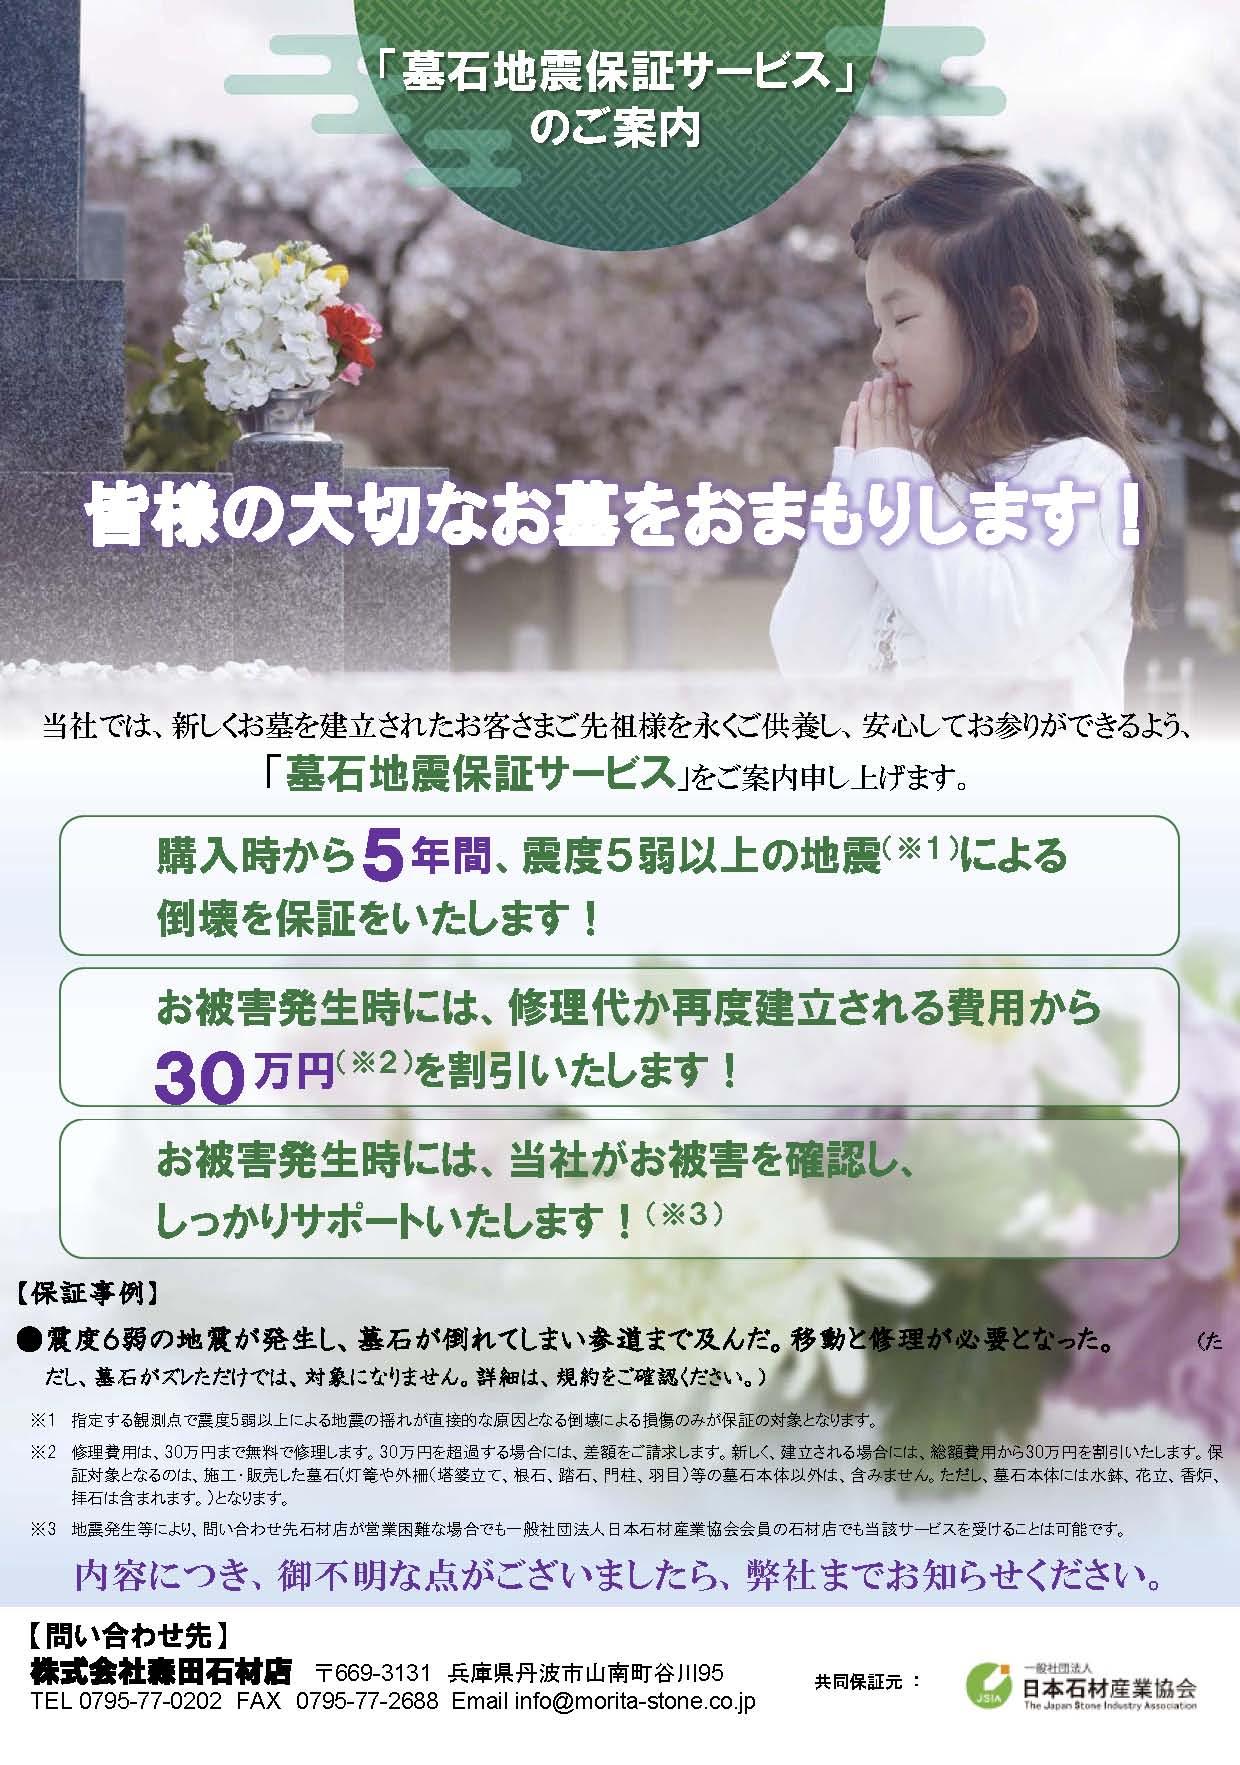 http://www.morita-stone.co.jp/weblog/img/%E5%9C%B0%E9%9C%87%E4%BF%9D%E9%99%BA%E3%81%AE%E3%83%81%E3%83%A9%E3%82%B7.jpg